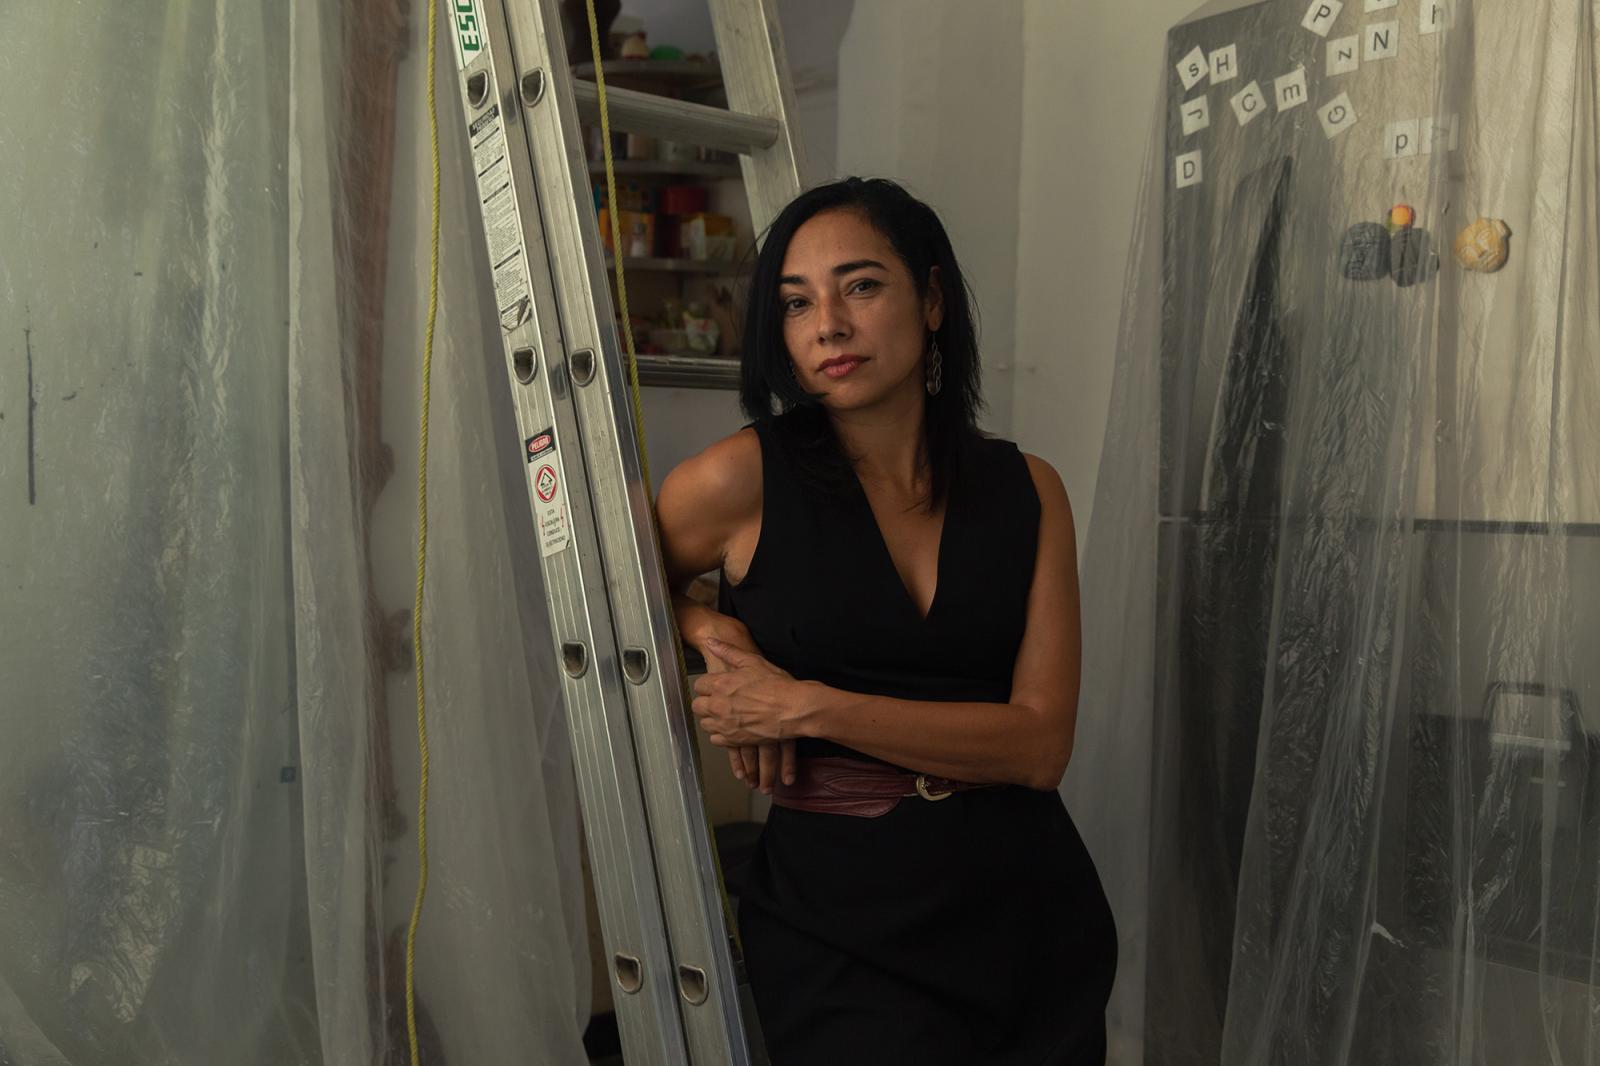 Artist Sandra Calvo at her home.